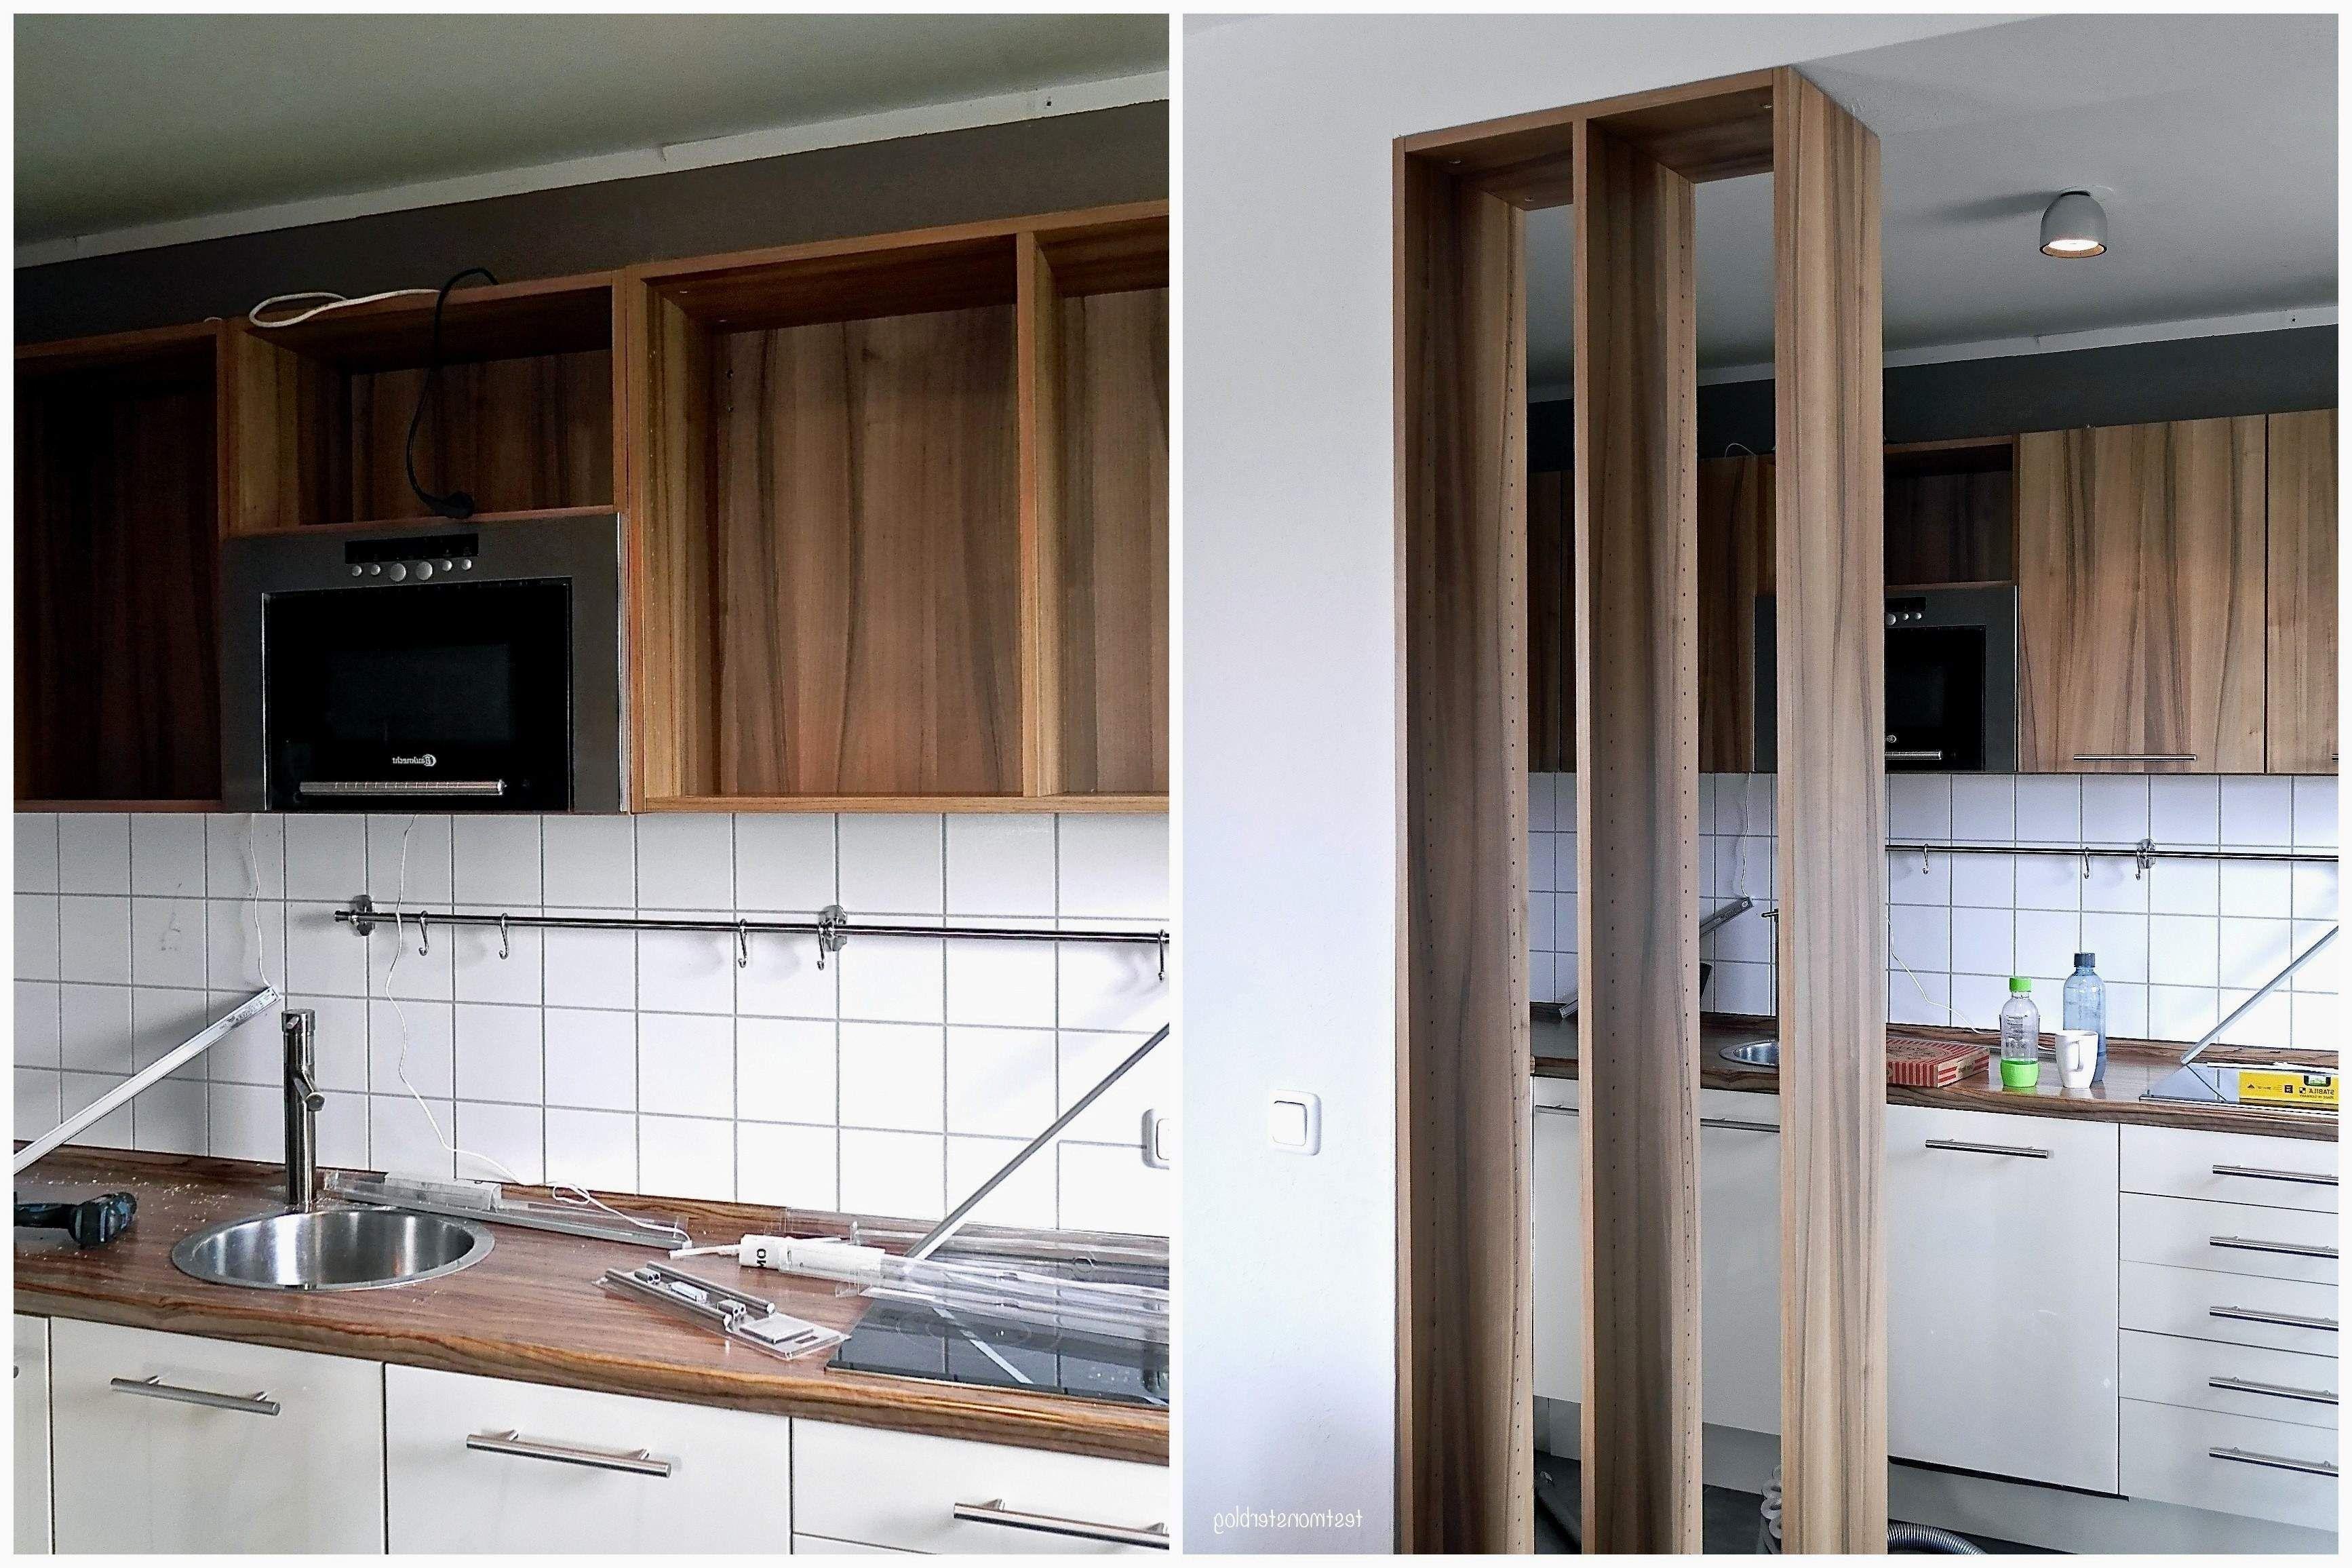 L Kuche Mit Insel Luxus Schon Kuche Kochinsel Ikea Kitchen Kitchen Decor